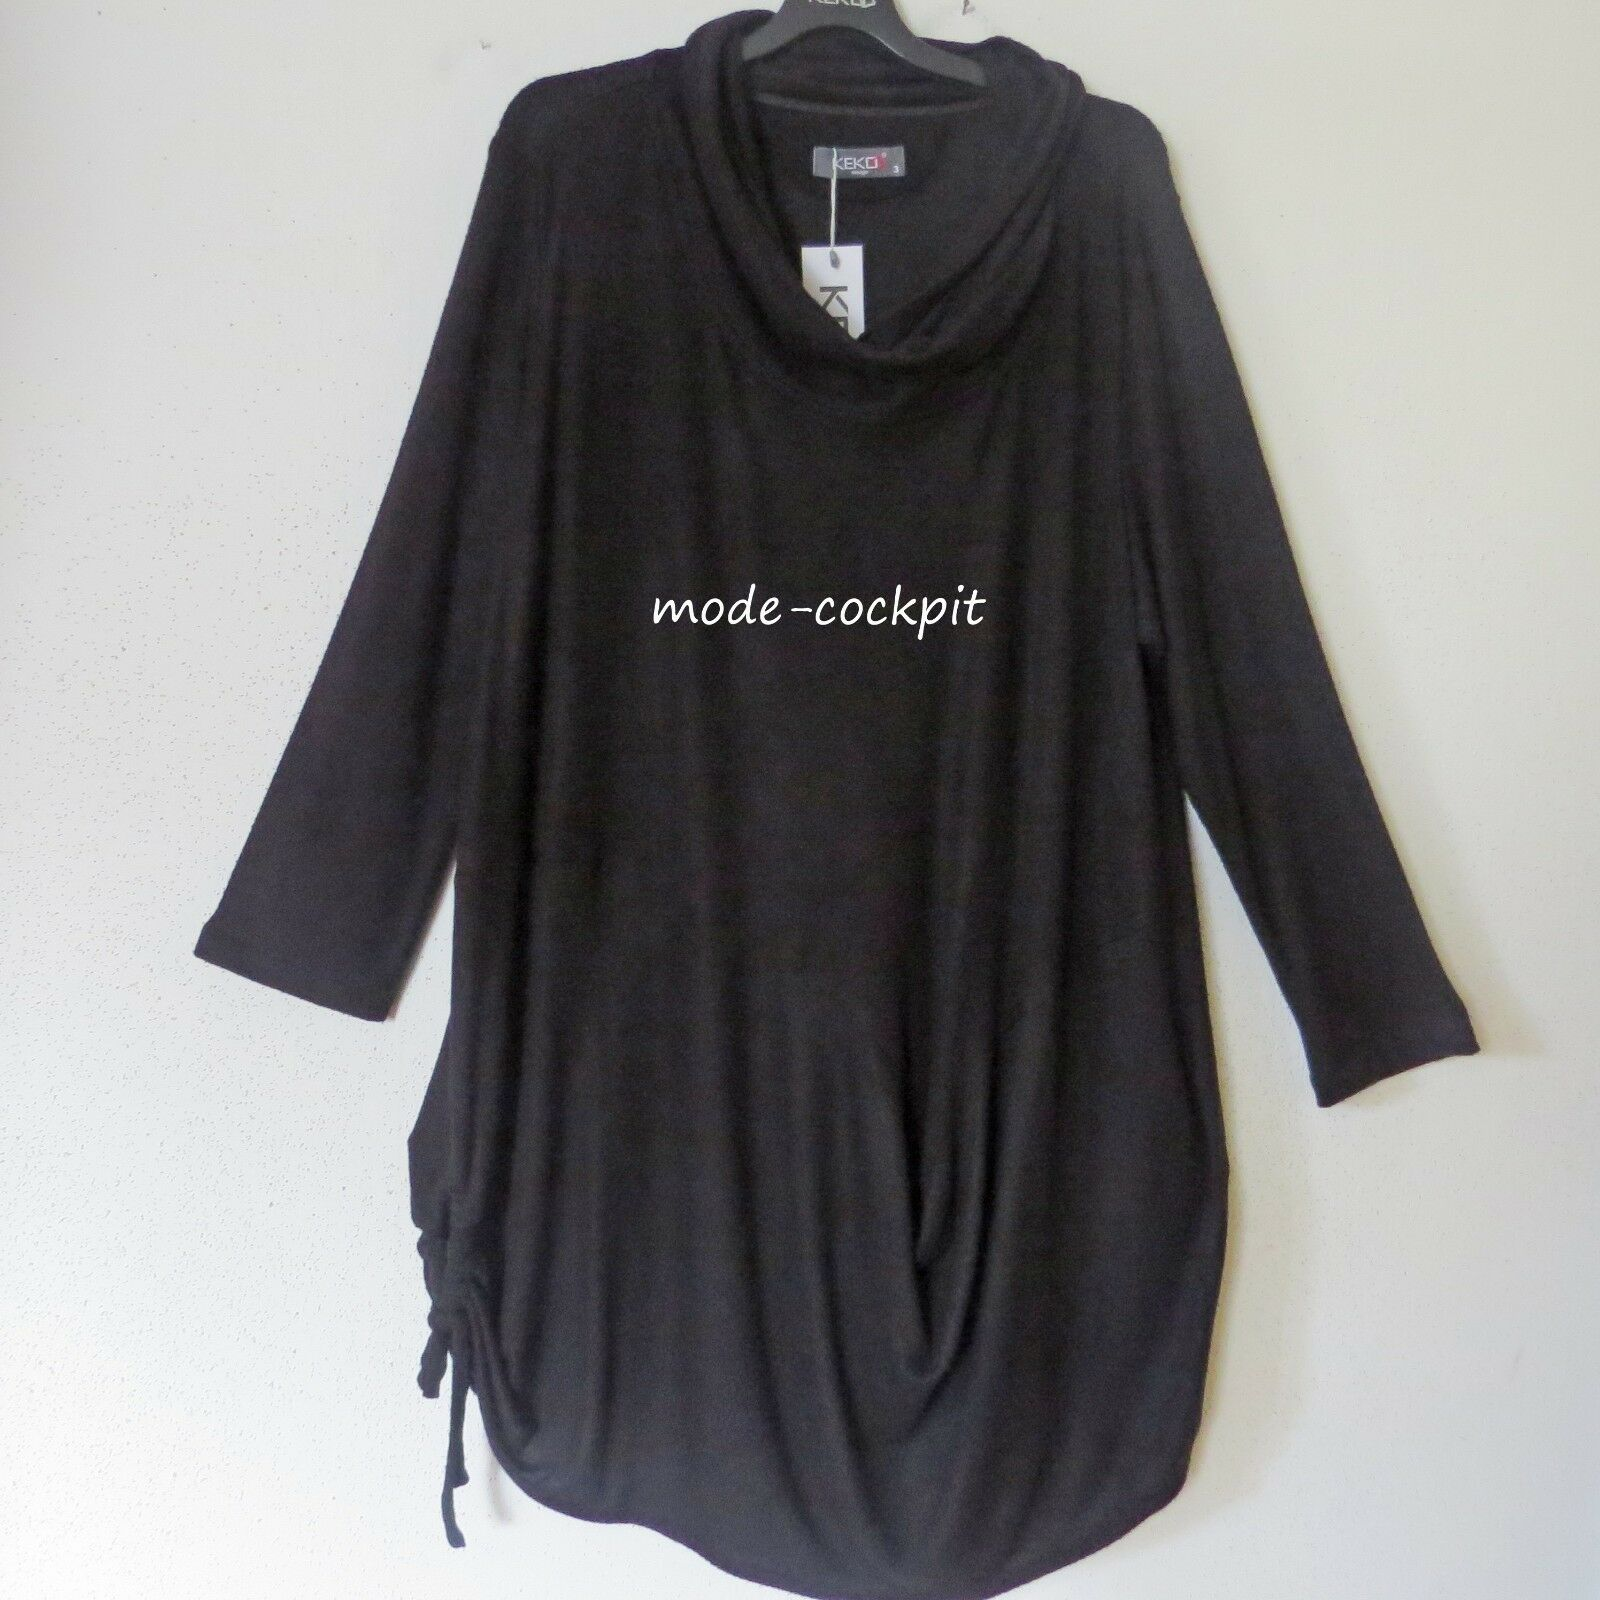 KEKOO softes Kuschel Tunika-Kleid Beulenoptik+Raffung black 52-54 (4)